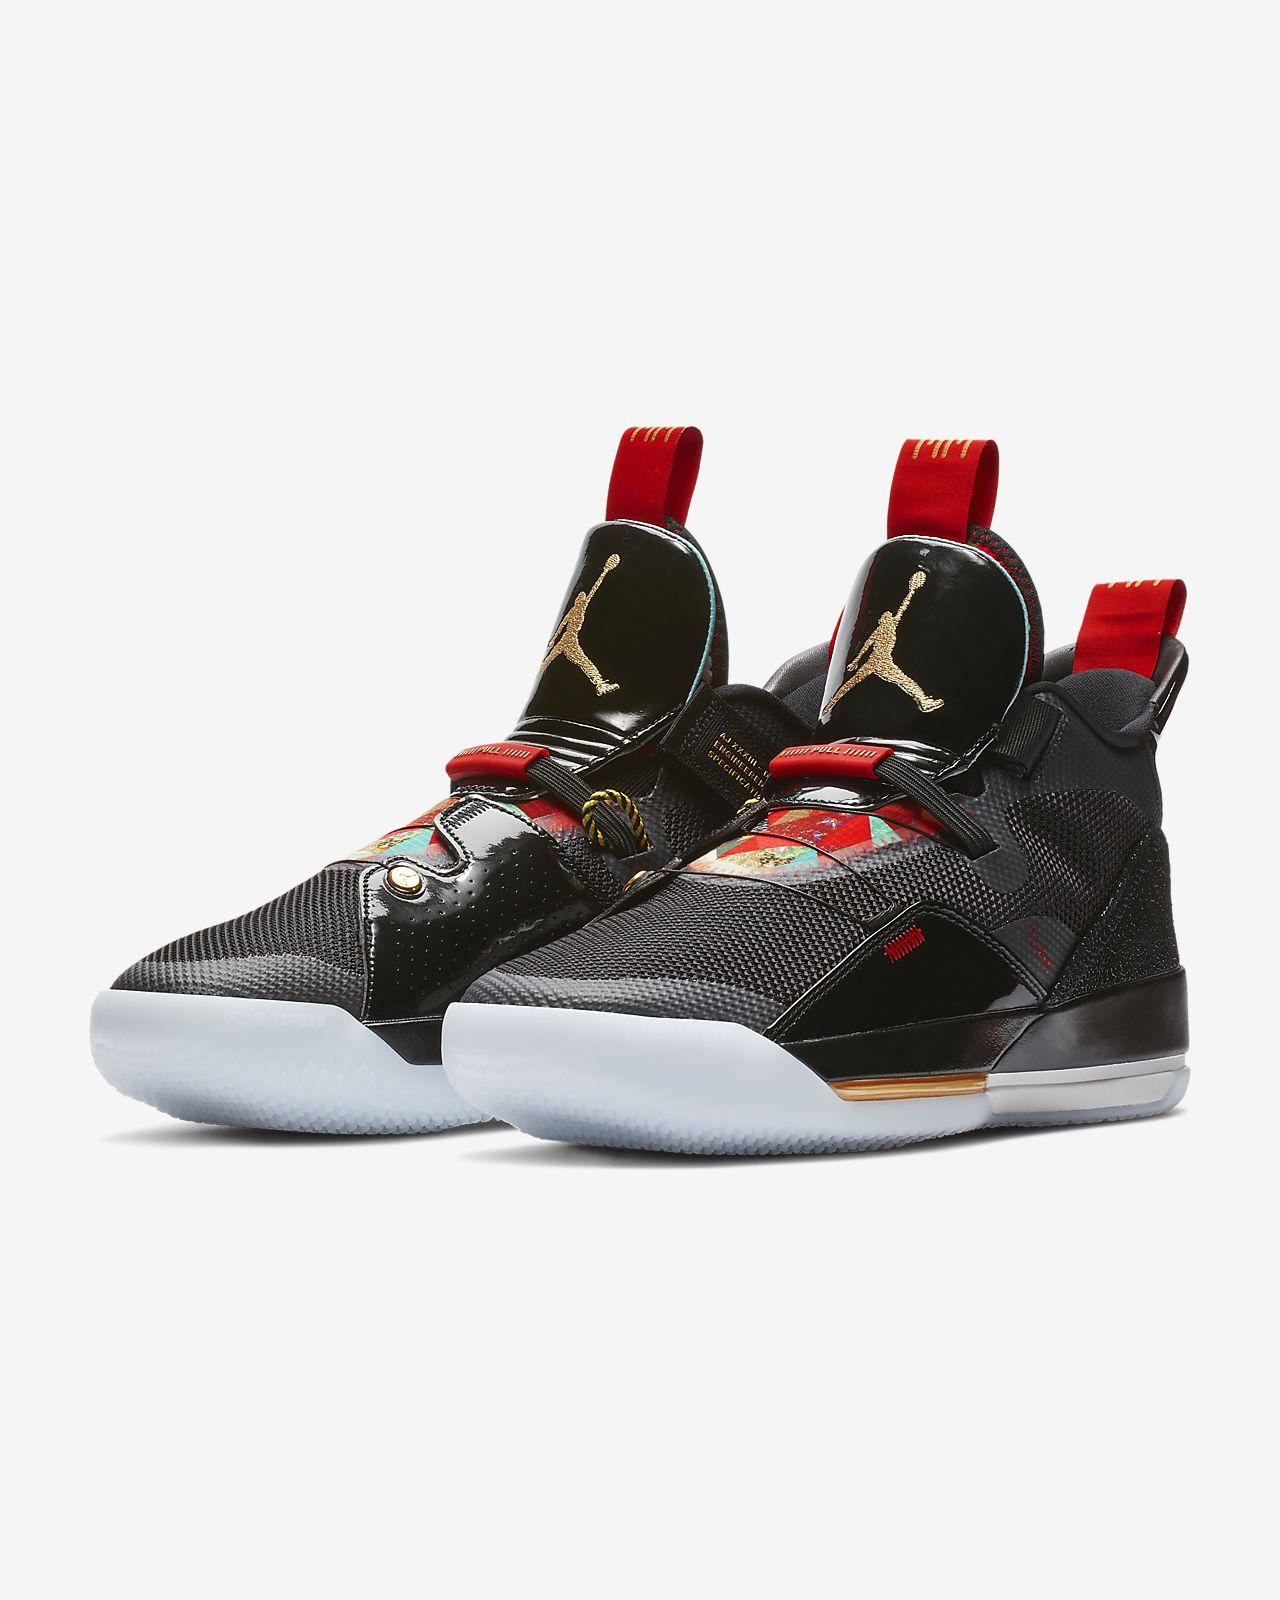 Basketball Xxxiii Jordan V7ybf6gy Air Shoe Nvn80mwO